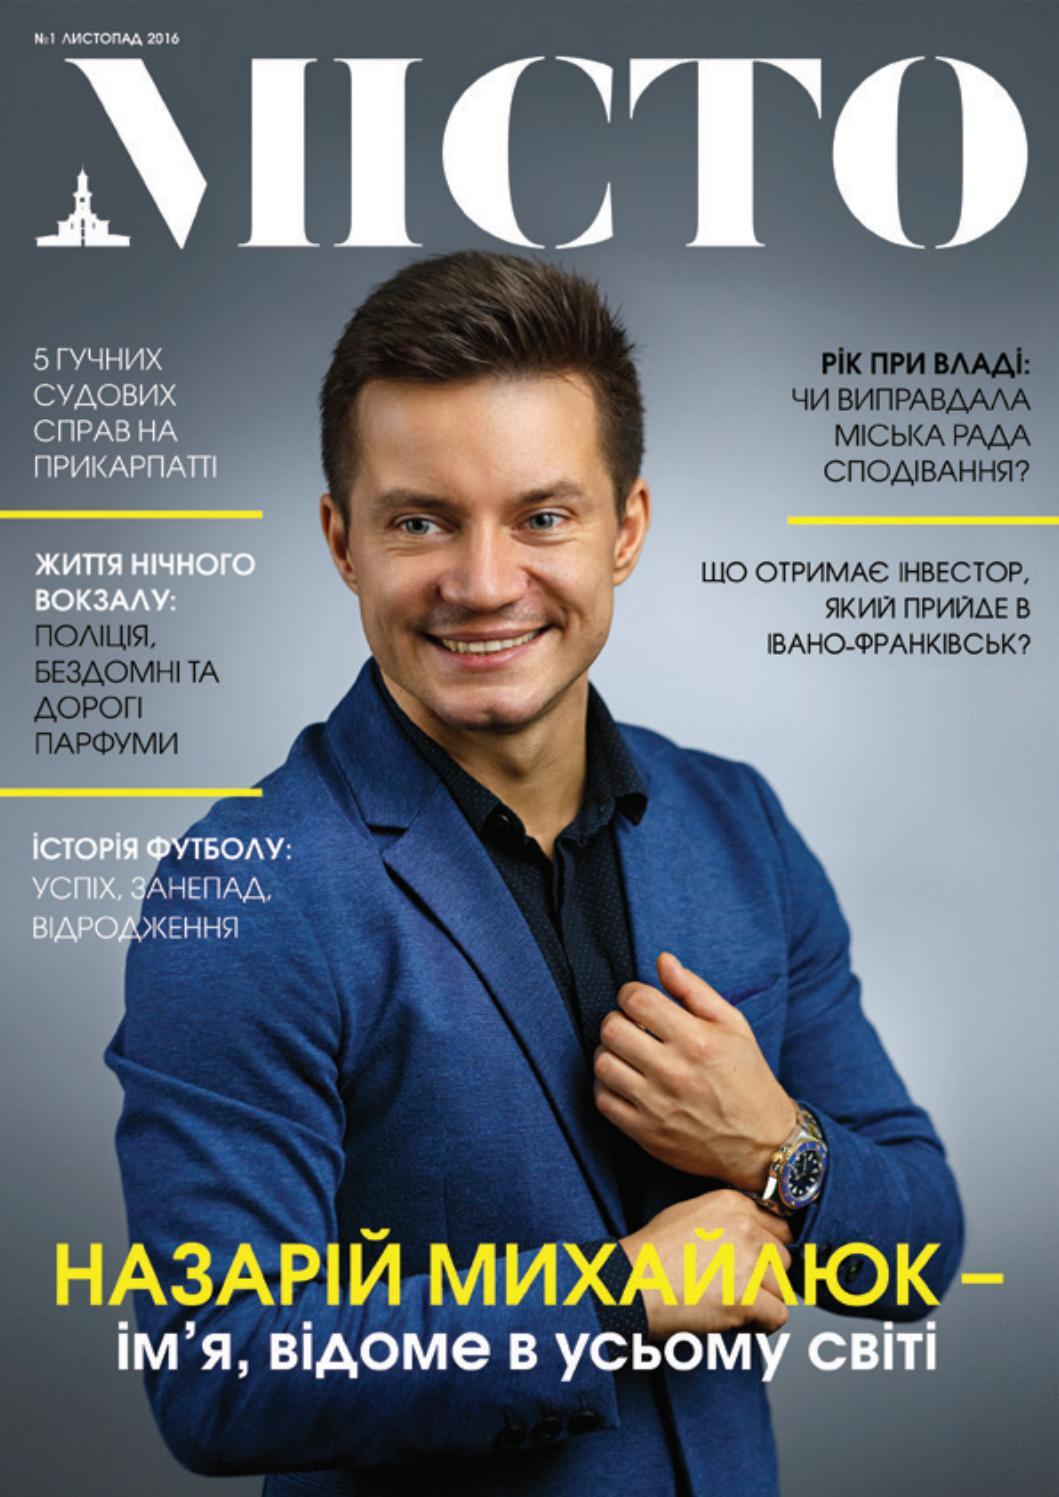 Журнал МІСТО № 1 by МІСТО - issuu 66d47c150dd40